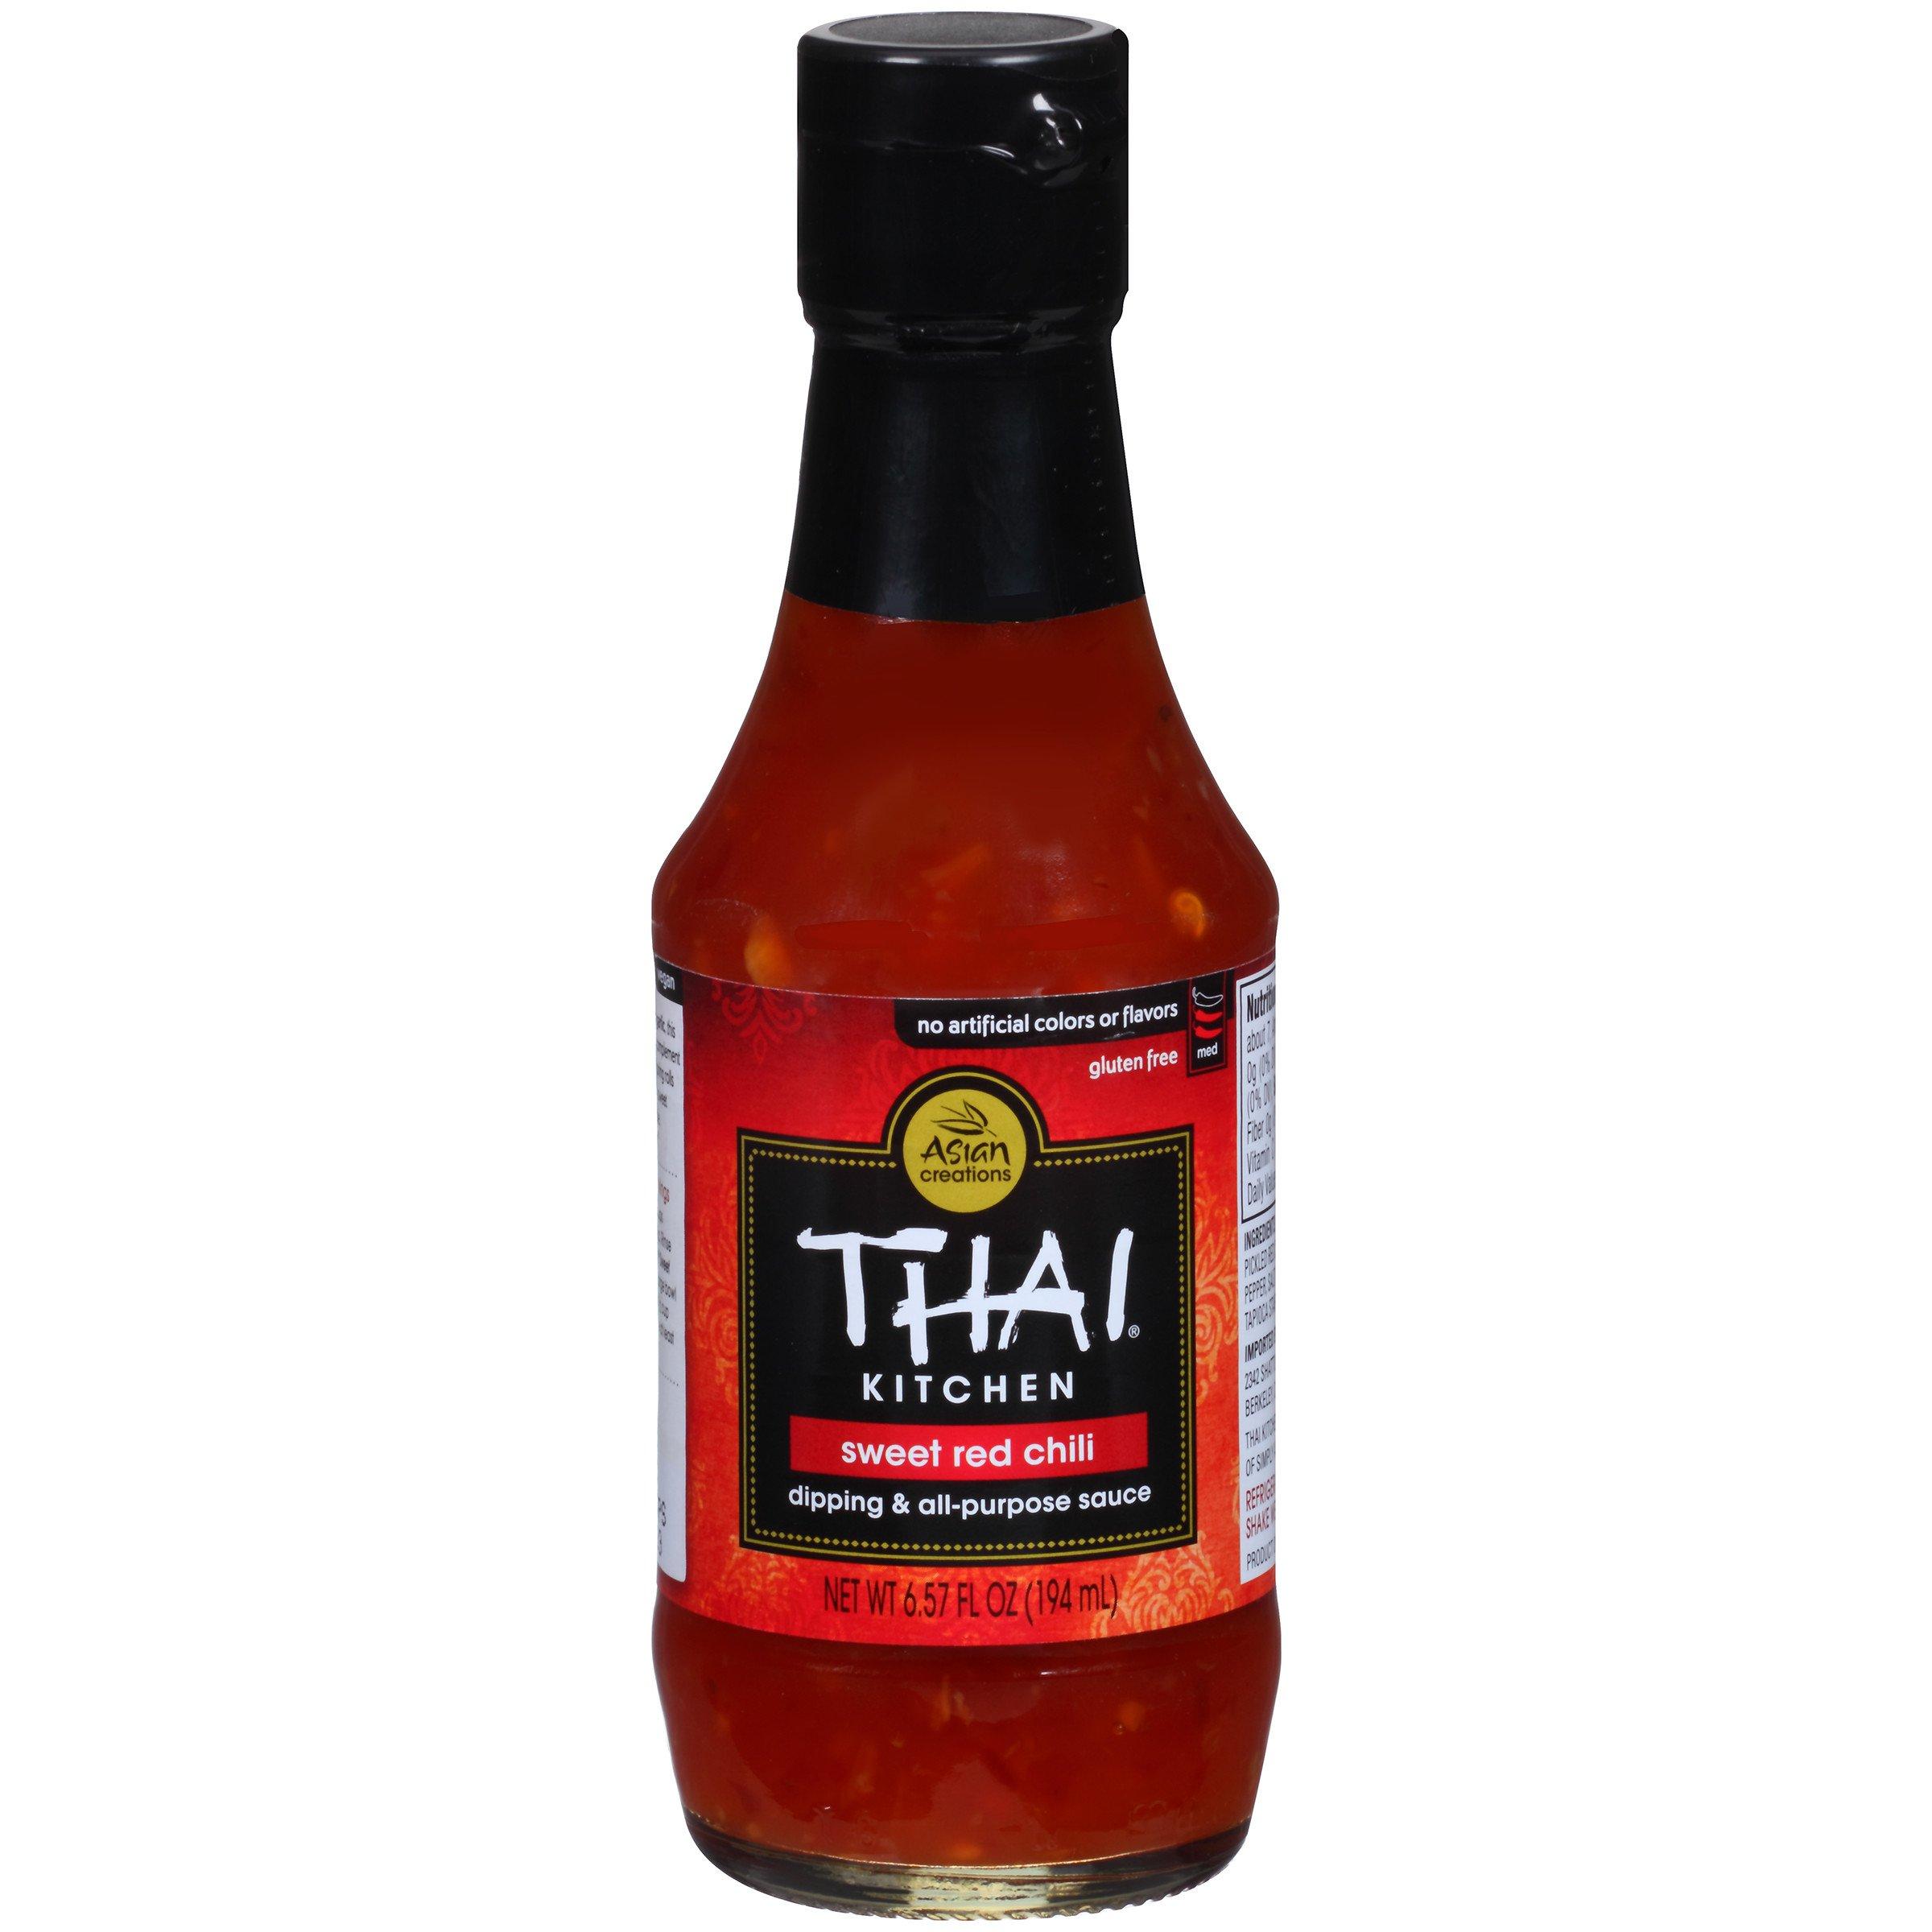 Amazon.com : Thai Kitchen Thai Chili & Ginger Dipping Sauce, 6.73 oz ...